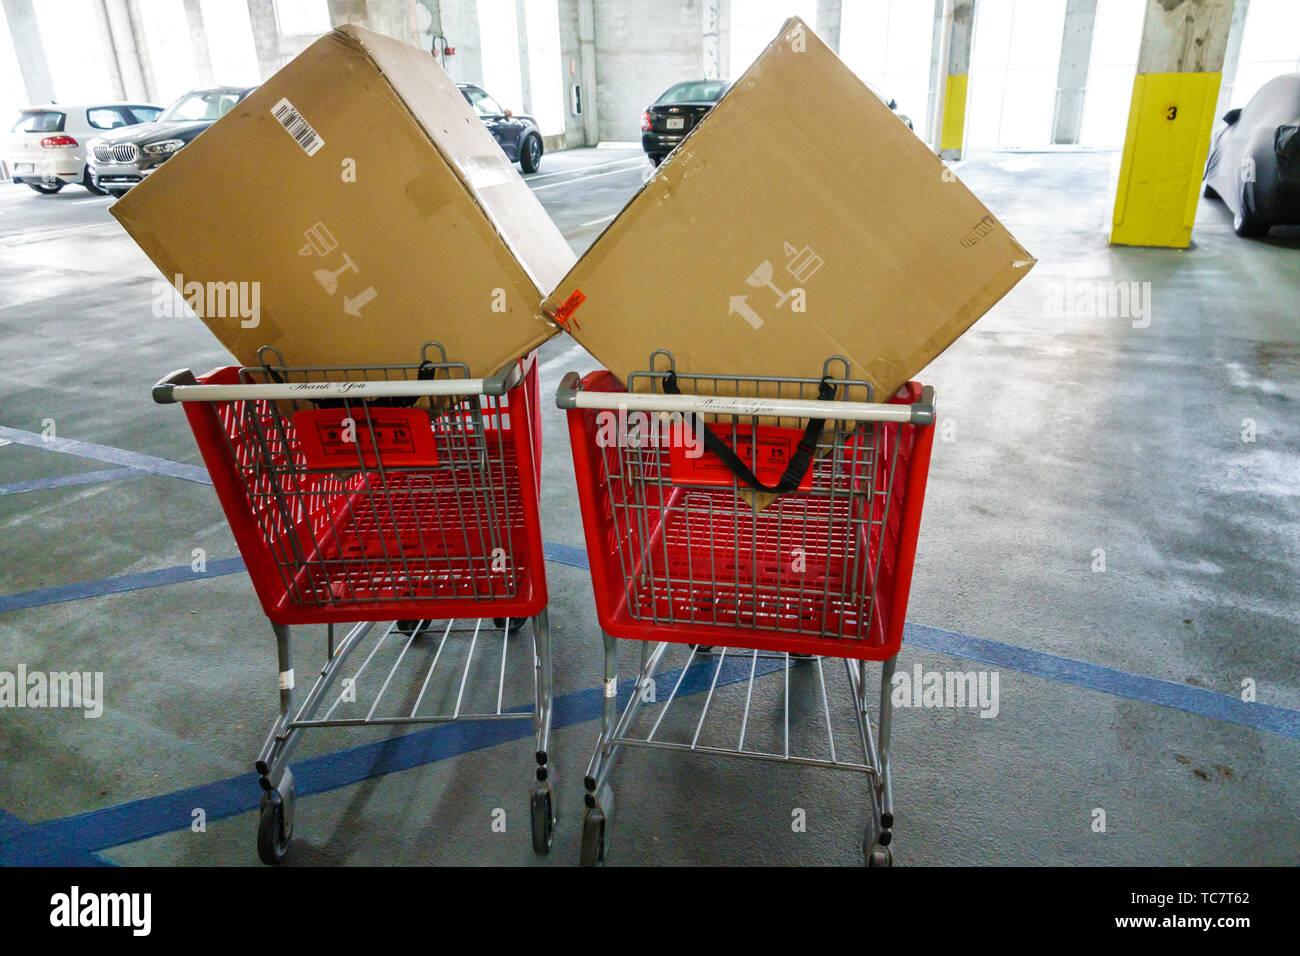 Miami Beach Florida parking garage large box boxes shopping cart carts trolley trolleys - Stock Image